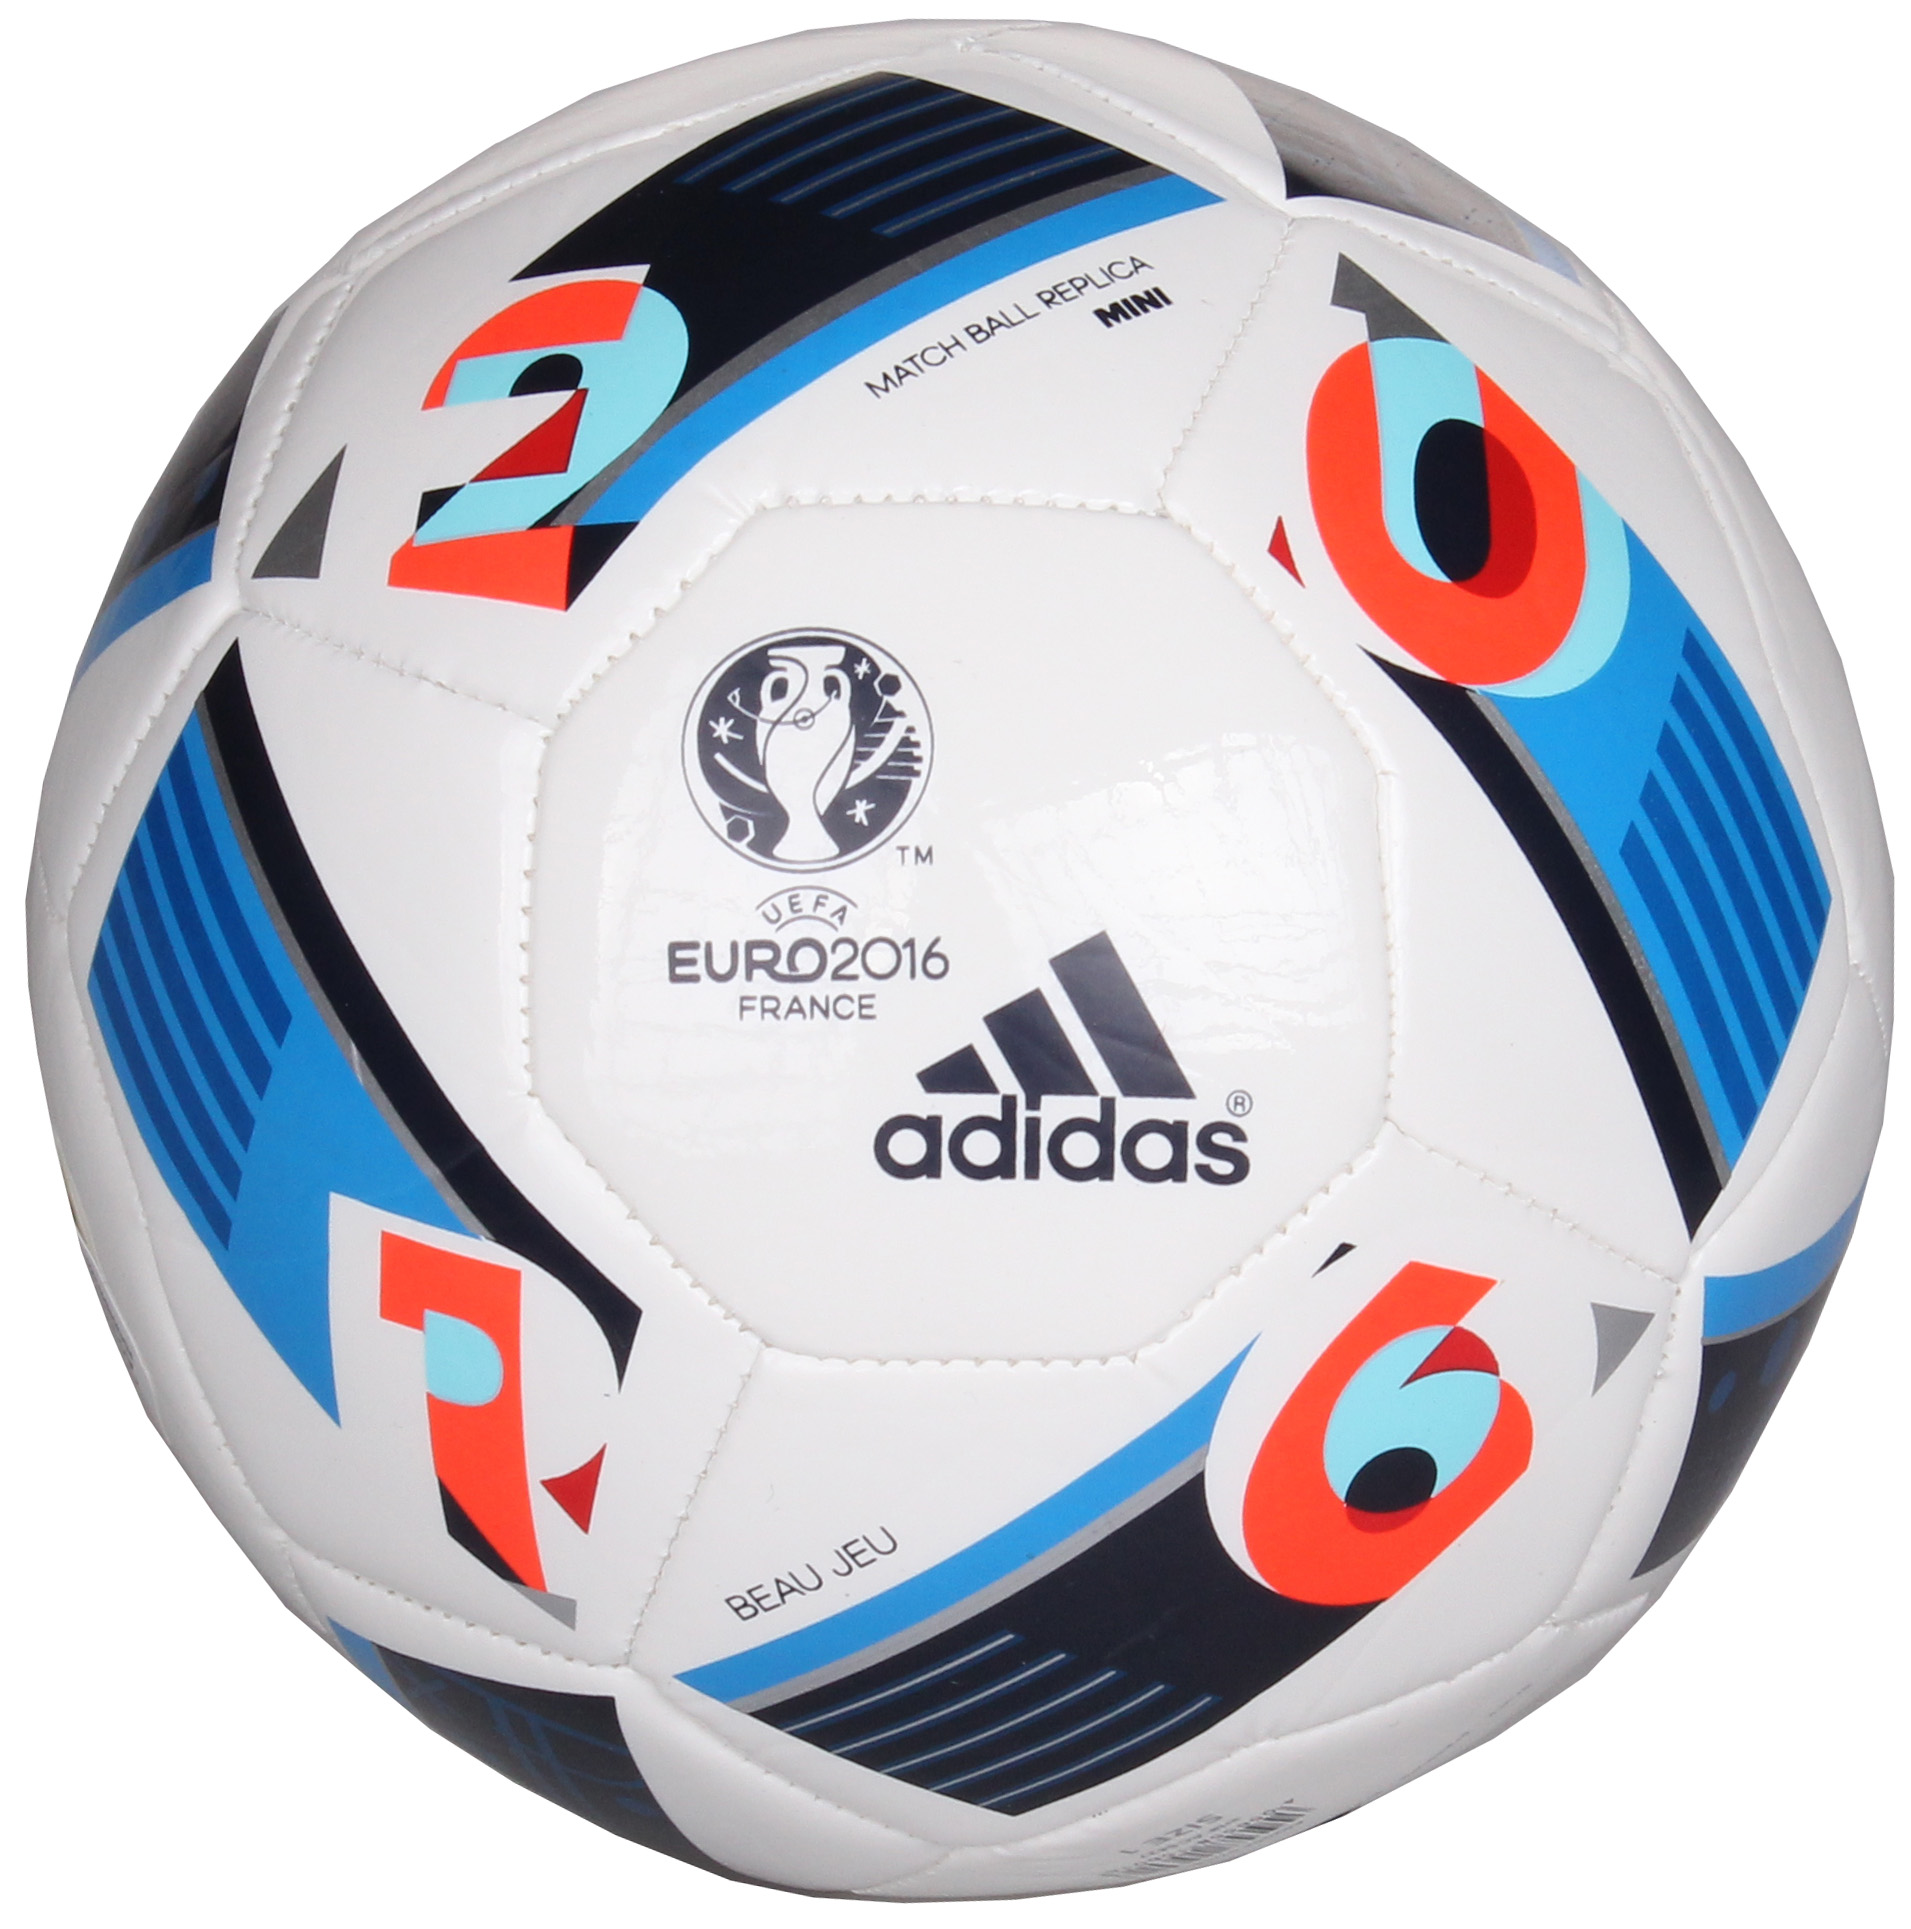 ADIDAS EURO 2016 Mini fotbalový míč - vel. 1